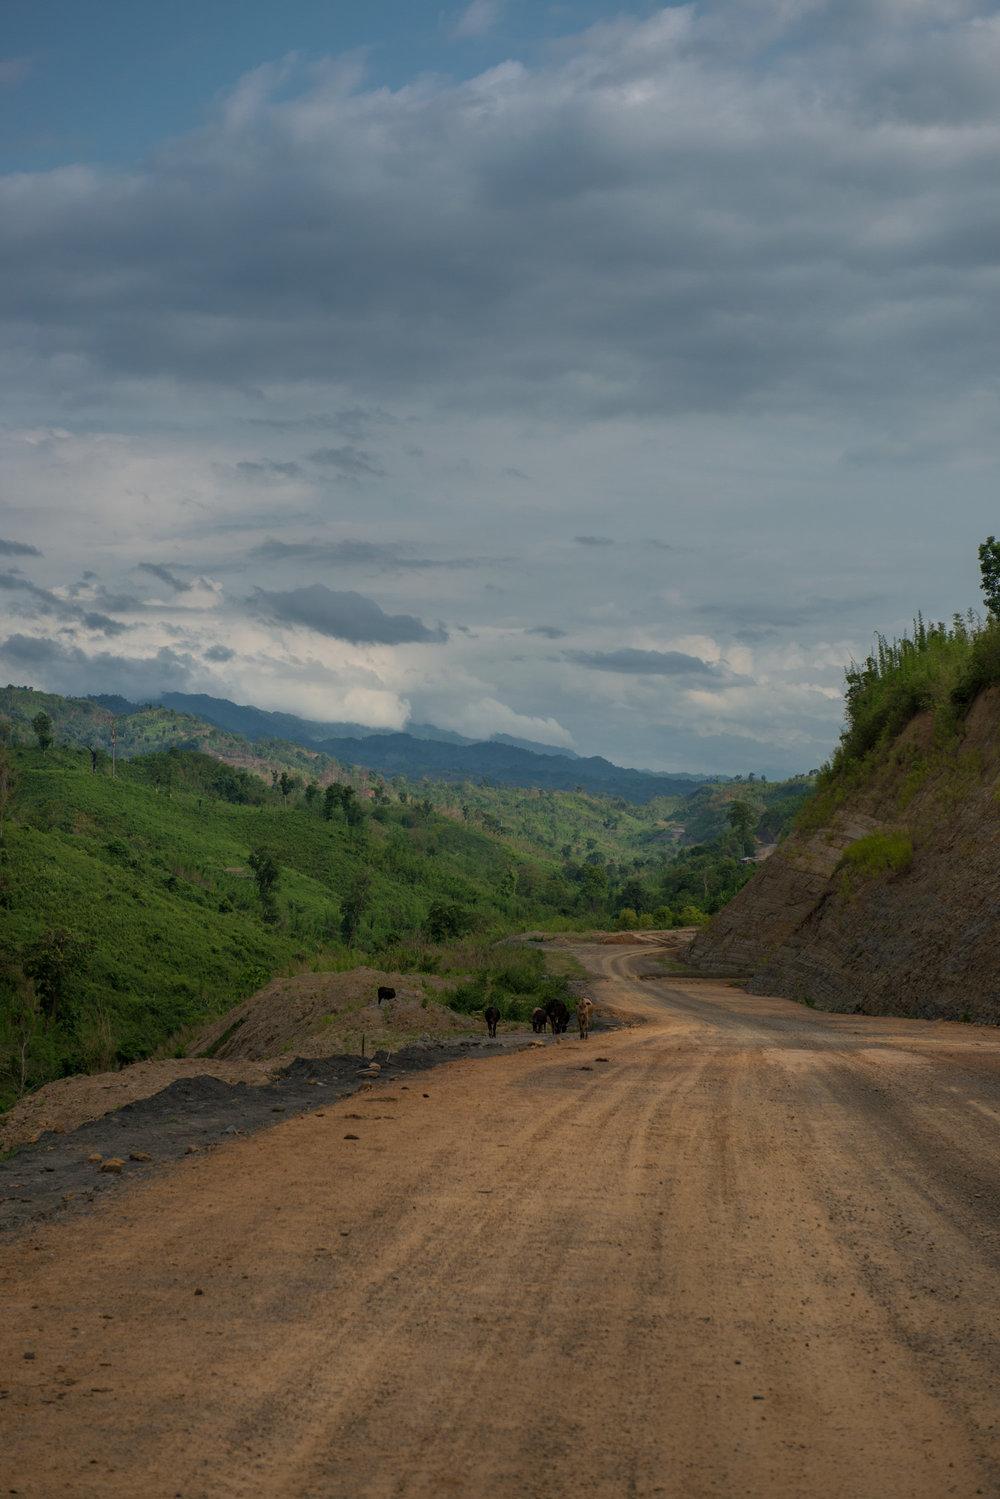 16_Chhandak Pradhan-Reportage-The_Promise_of_Asphalt-Border_road_NE India_Burma_Le Monde.jpg